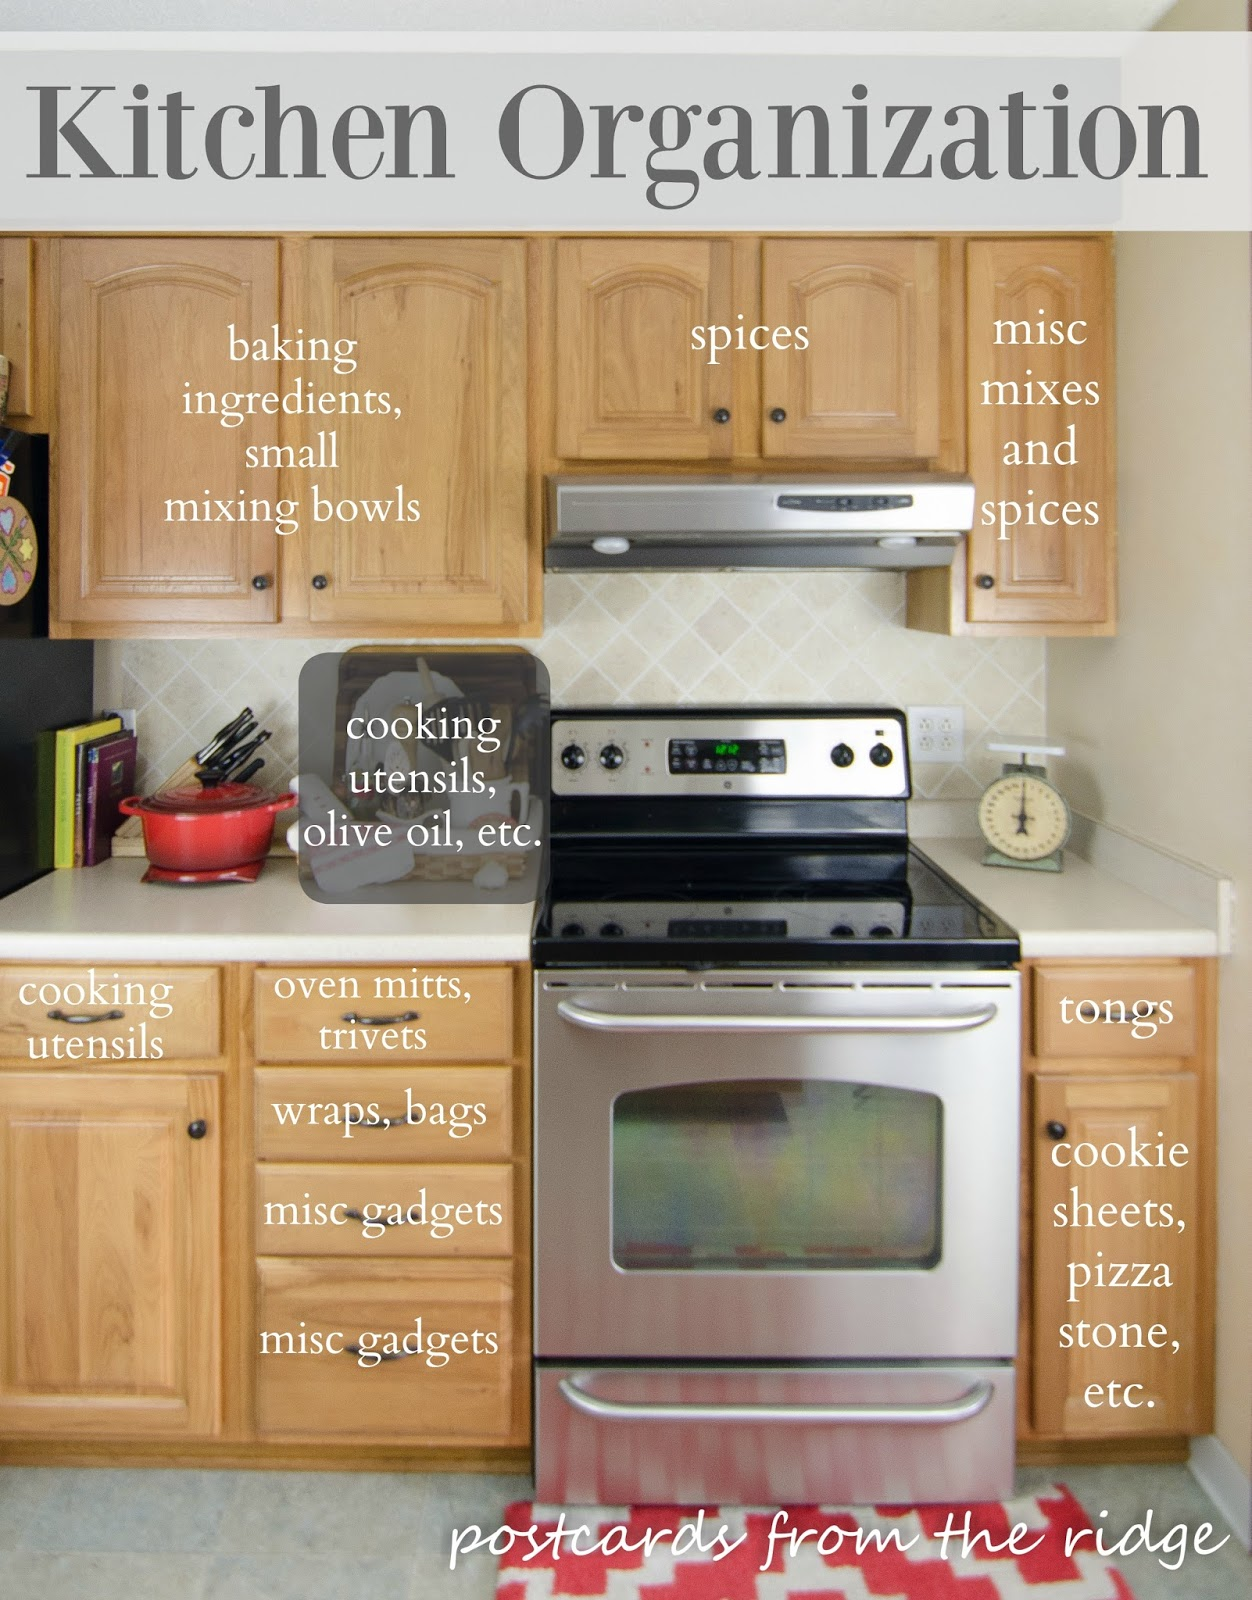 Kitchen Organization Tips | Postcards from the Ridge